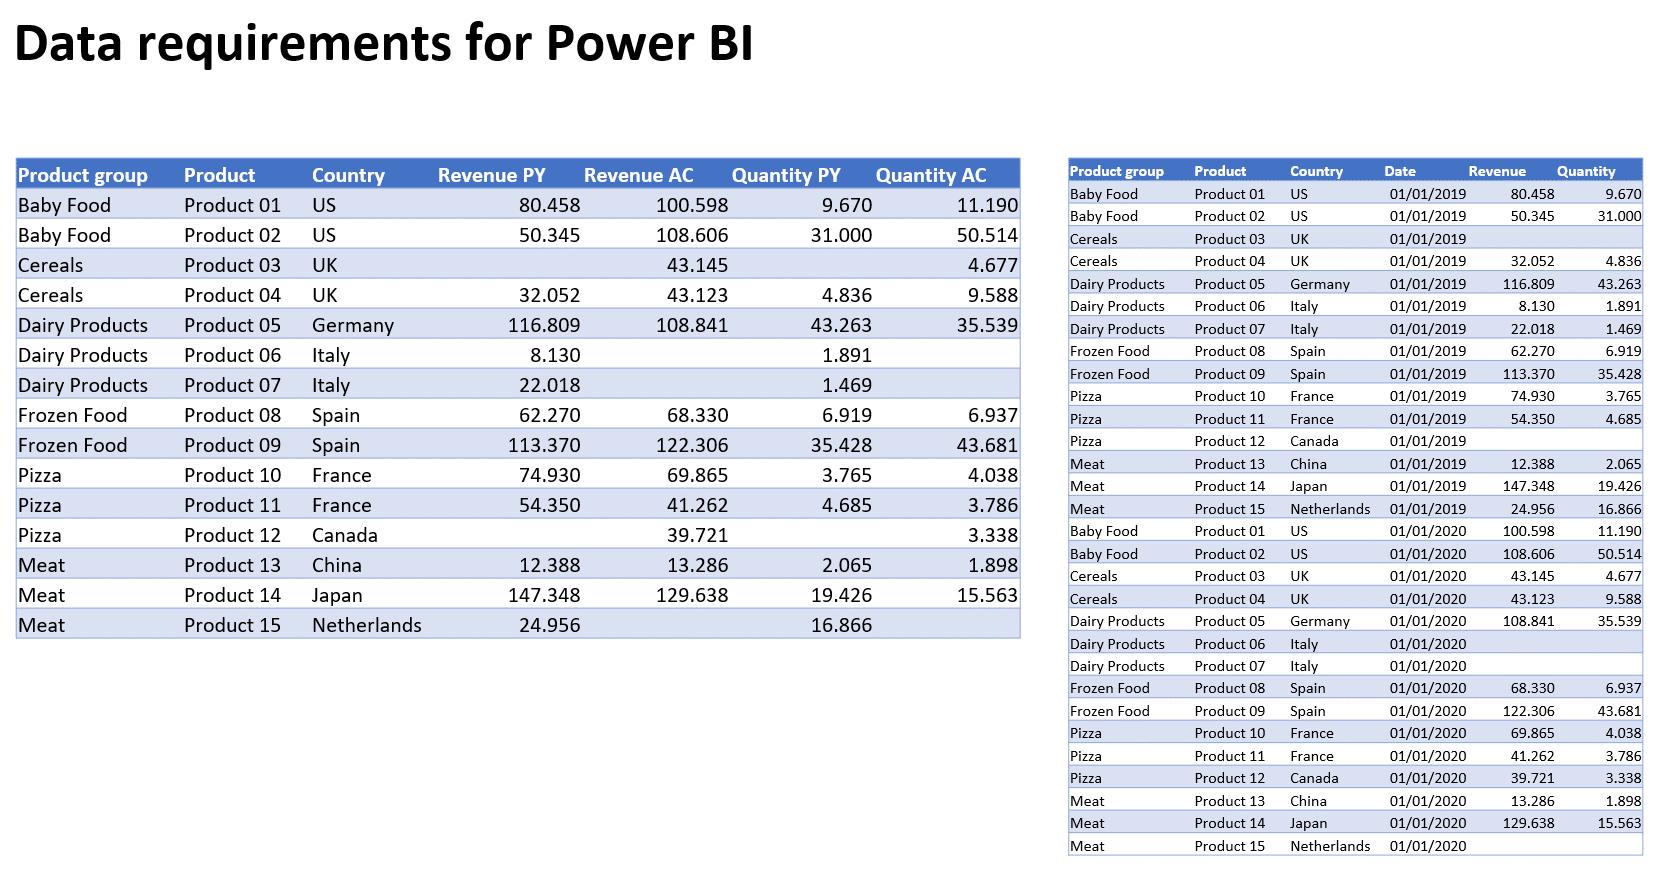 Preparing data in Excel for Price Volume Mix analysis